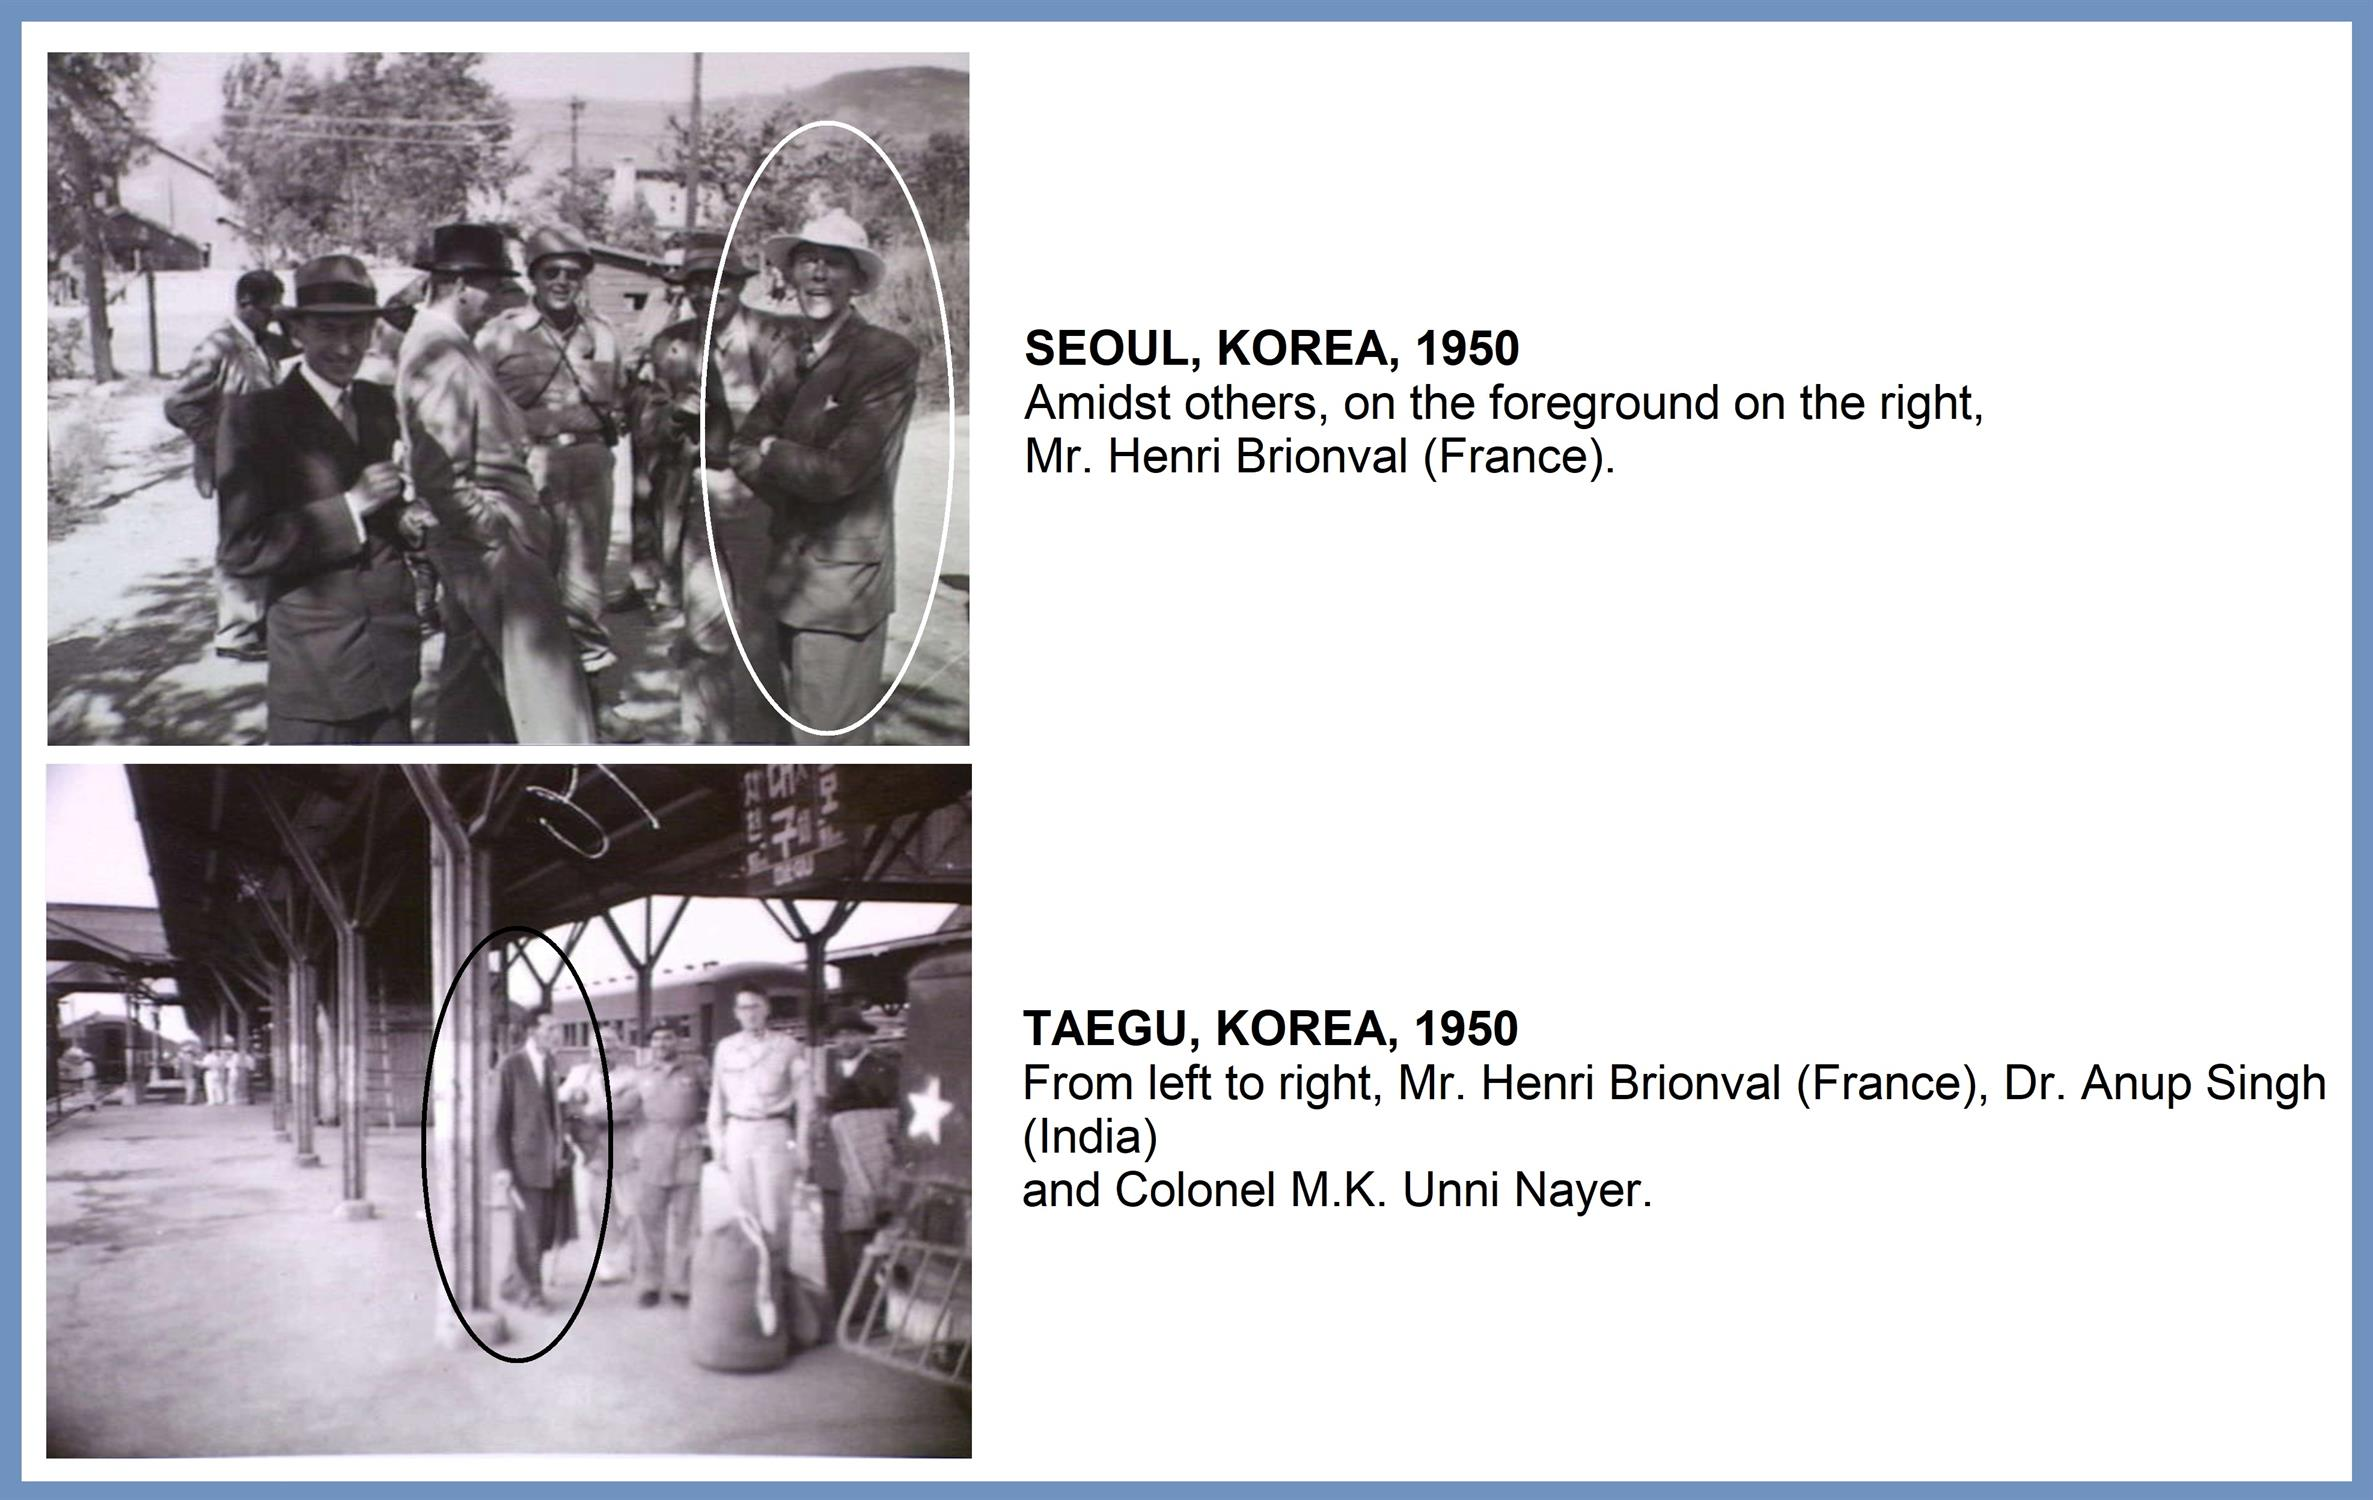 A CONICAL SHAPED CELADON GLAZED STONEWARE BOWL Korea, Joseon Dynasty H: 5cm - D: 13.3cm - Image 8 of 8